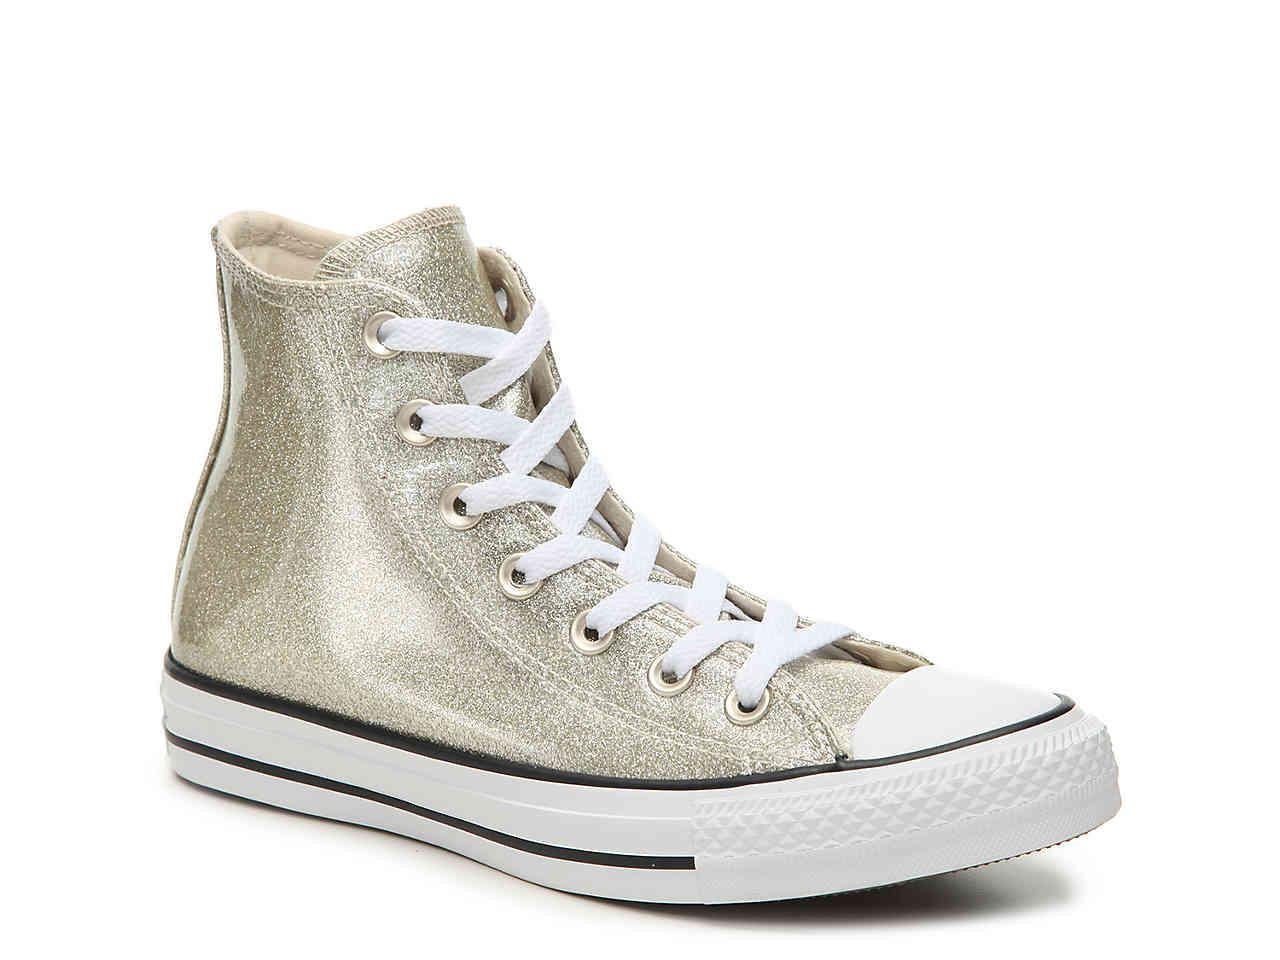 Lyst - Converse Chuck Taylor All Star Glitter High-top Sneaker in ... a0f65c53c